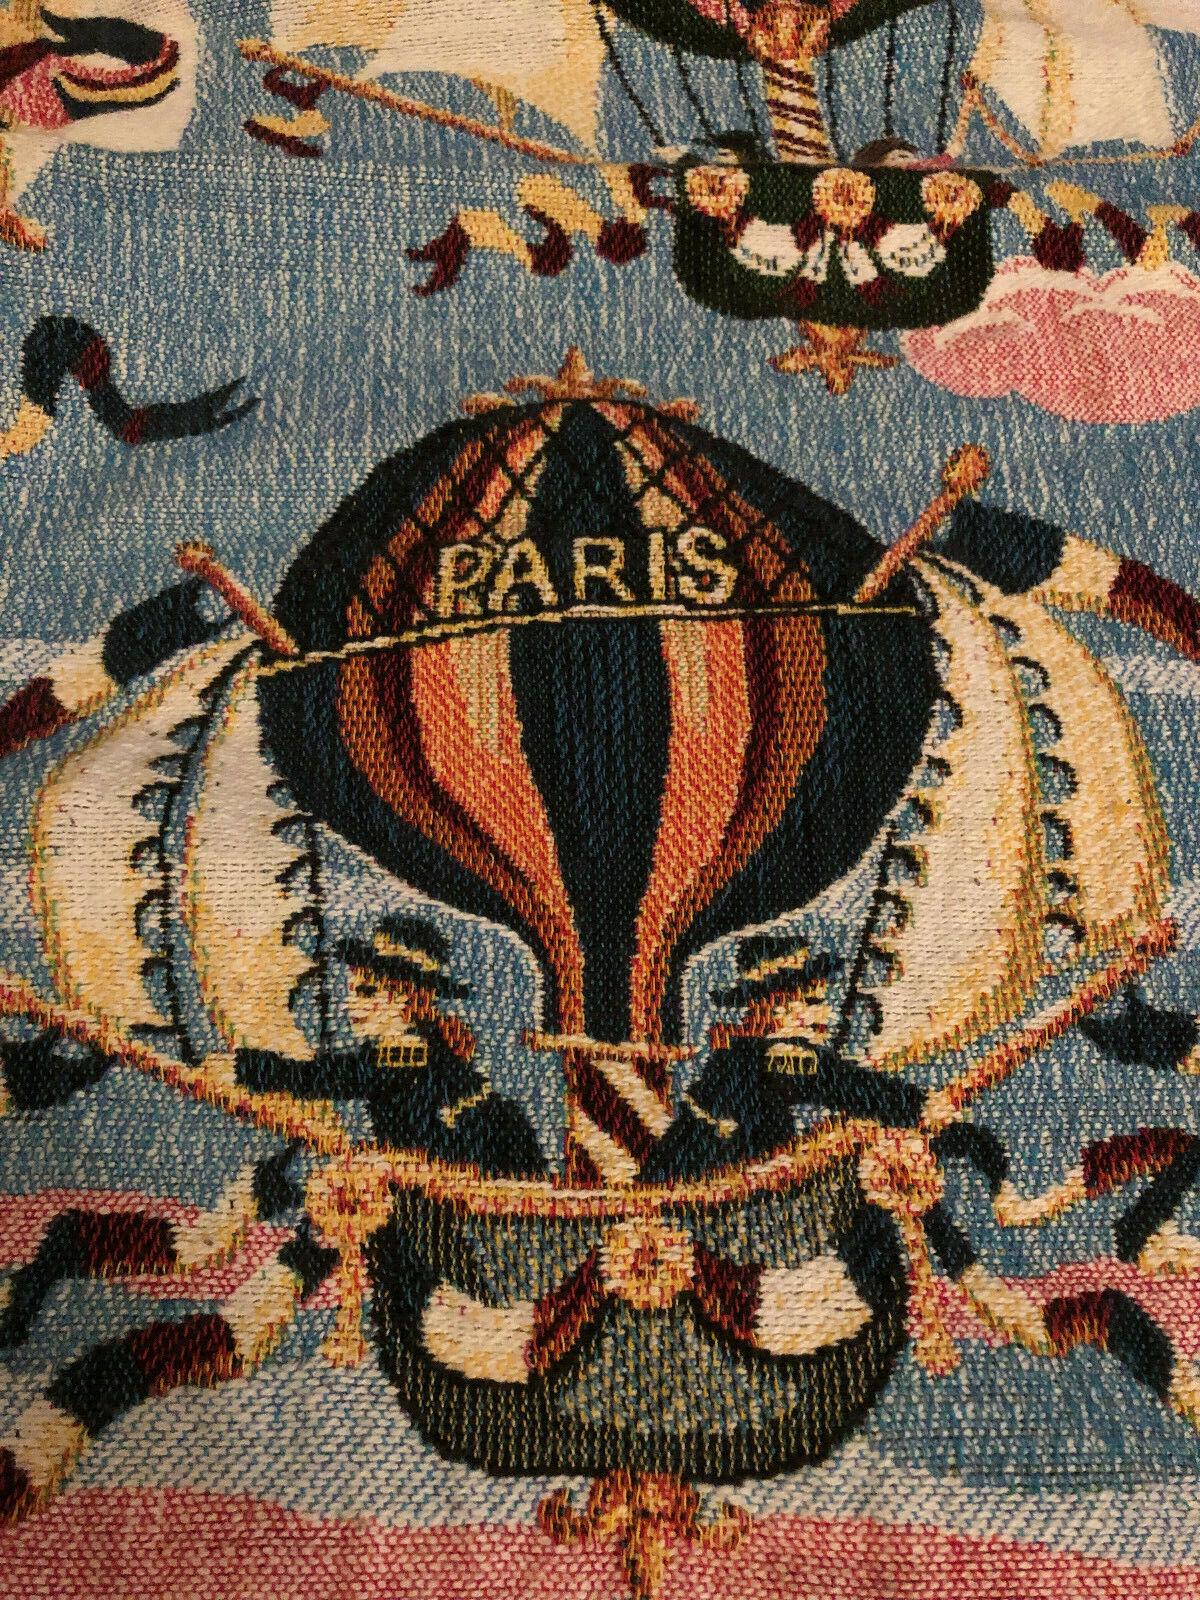 Vintage Goodwin Weavers Tapiz Manta Hot Air Balloon PARIS flecos